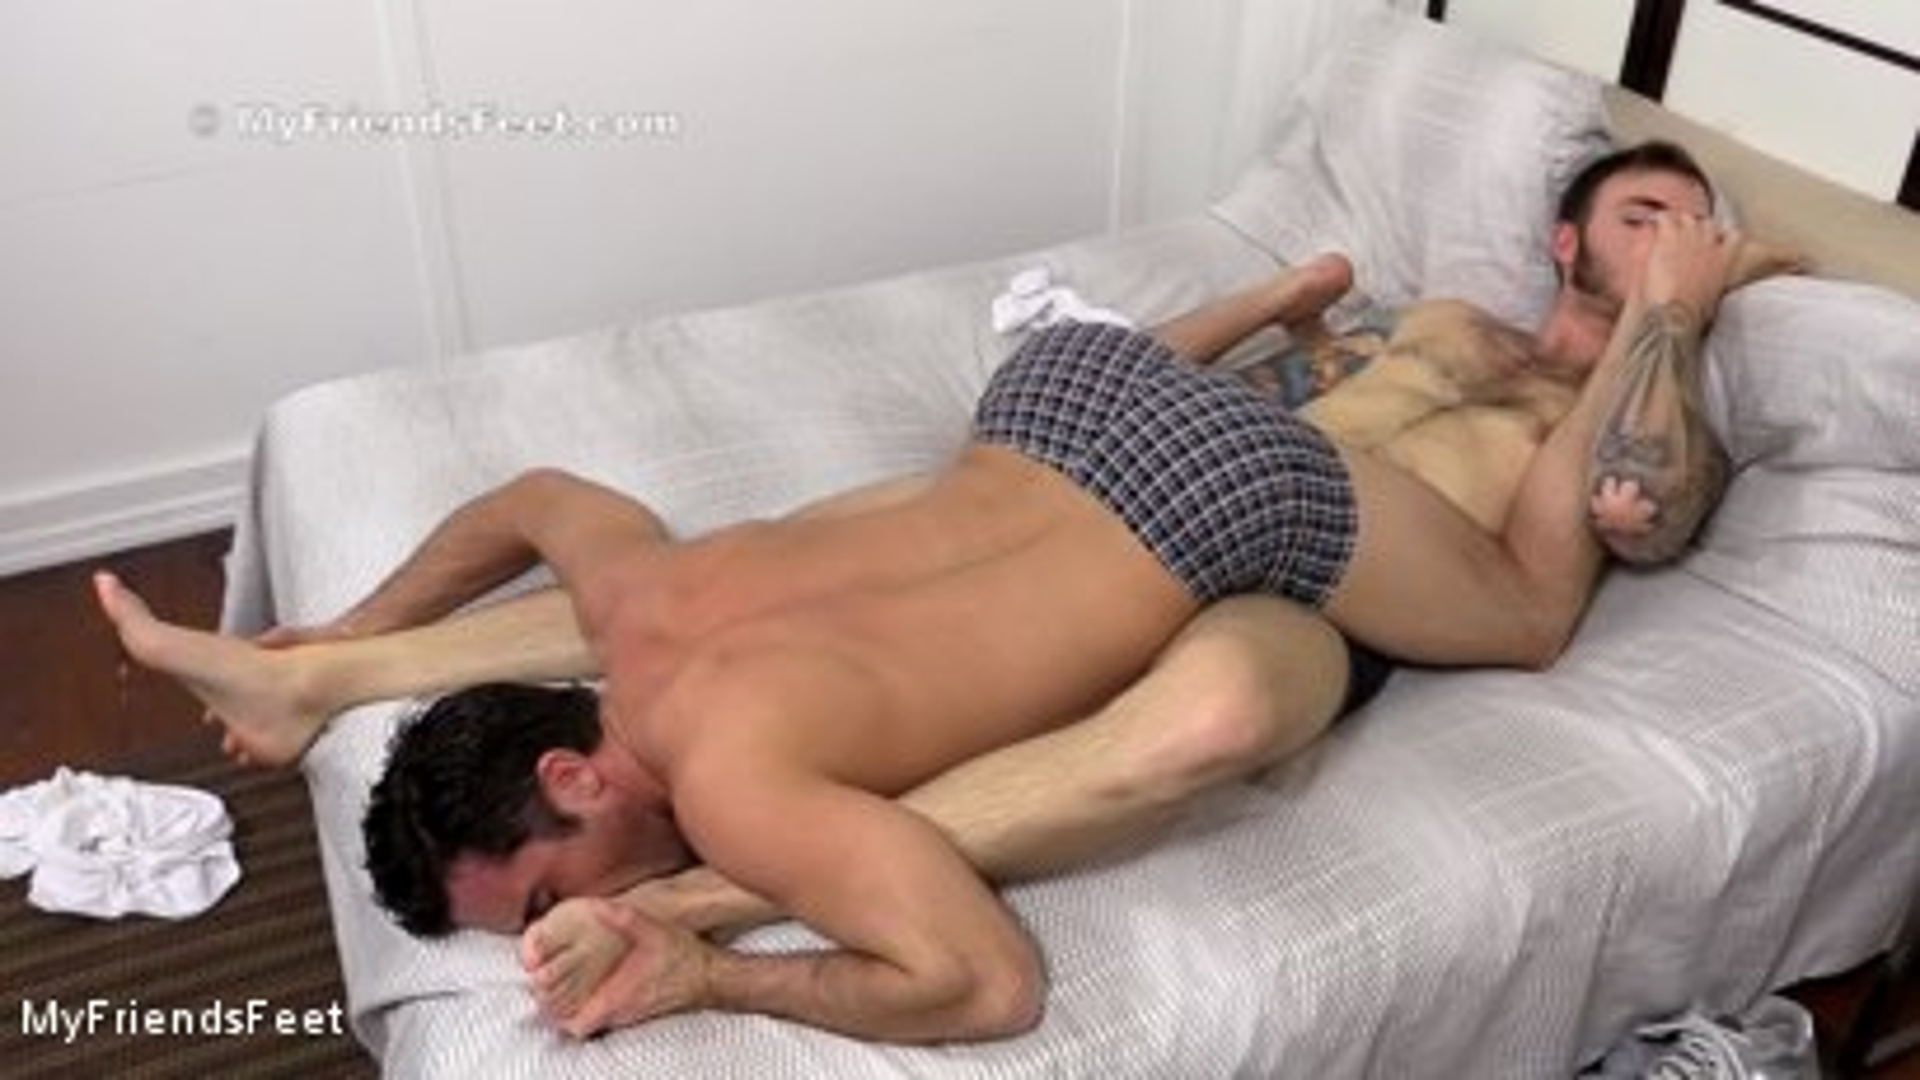 Christian Wilde & Lance Hart Have Foot Sex